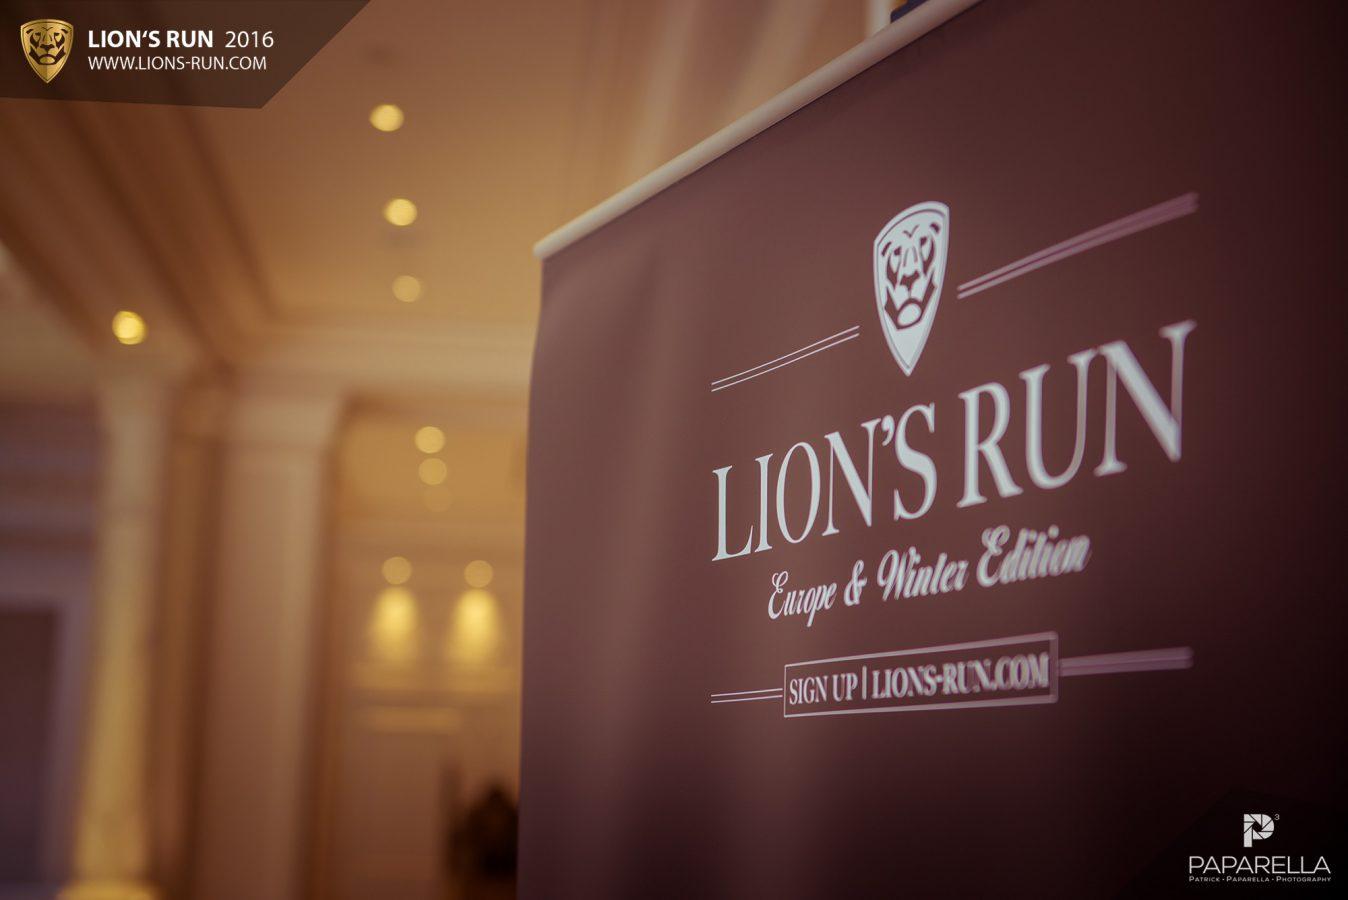 Lions_Run_summer_edition-2015_195